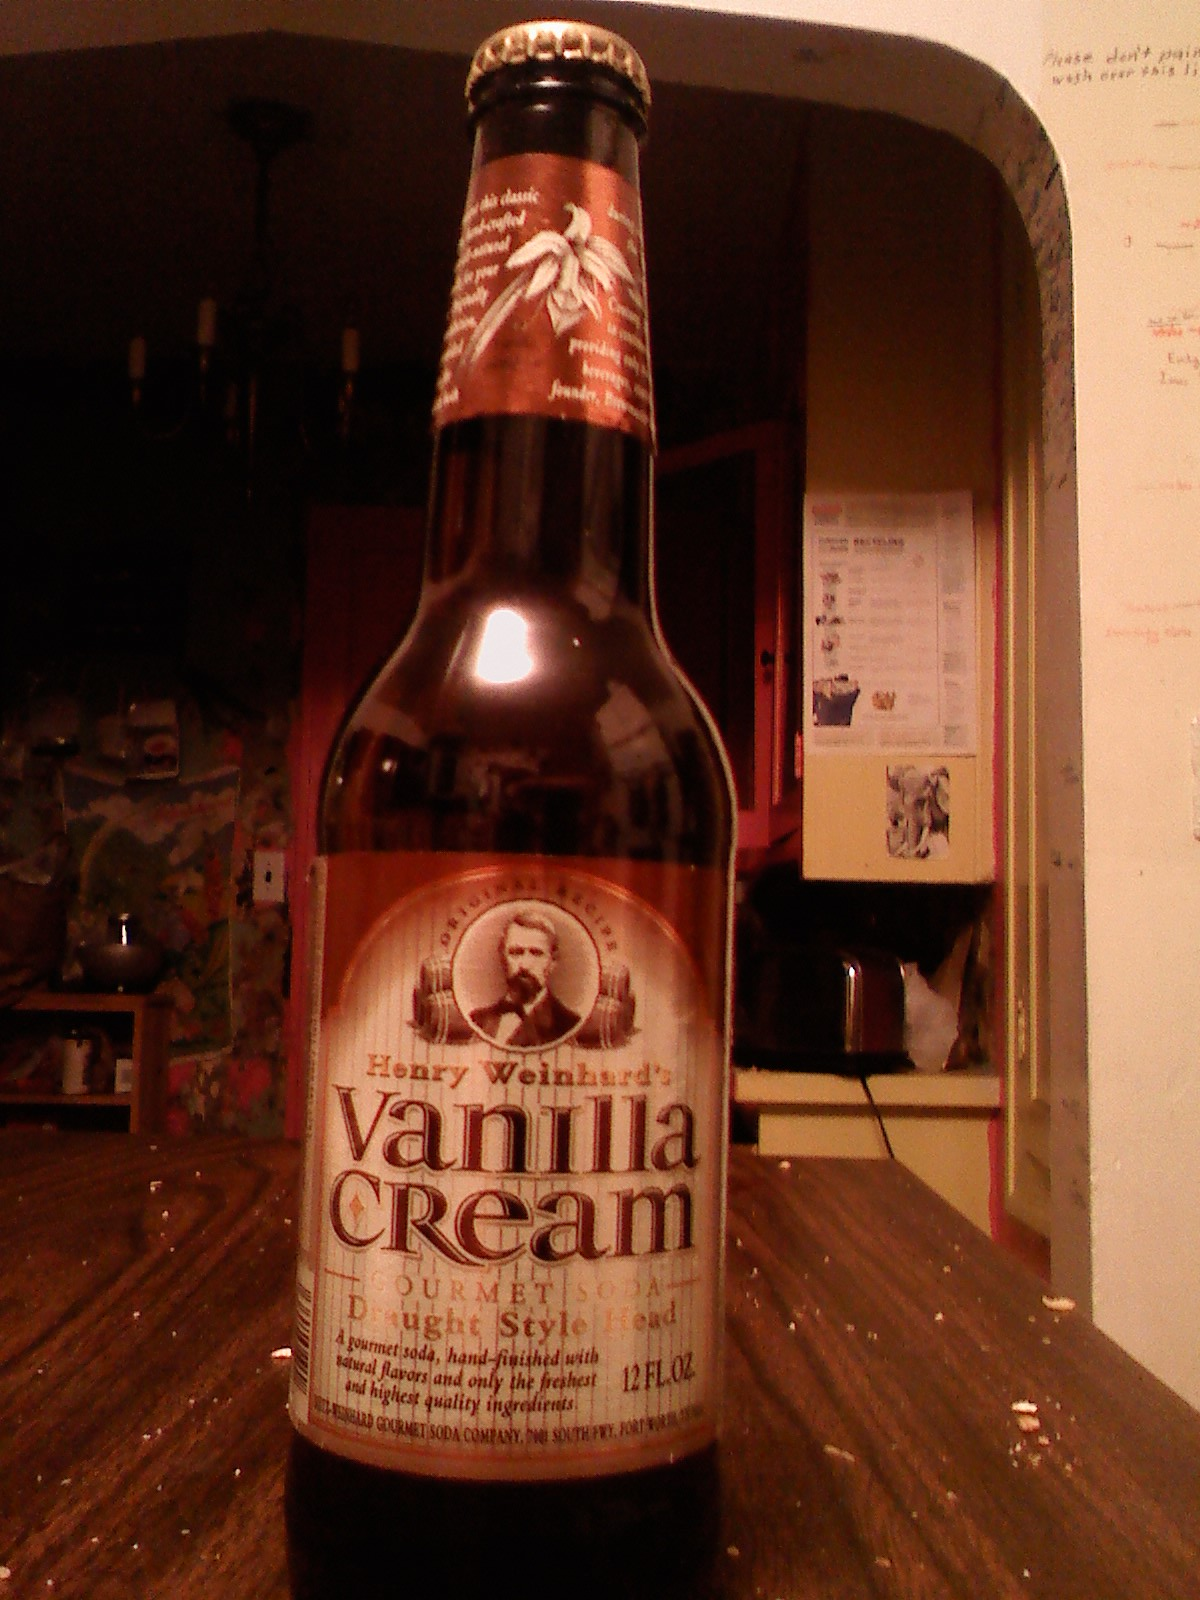 roddy piper beer bottle